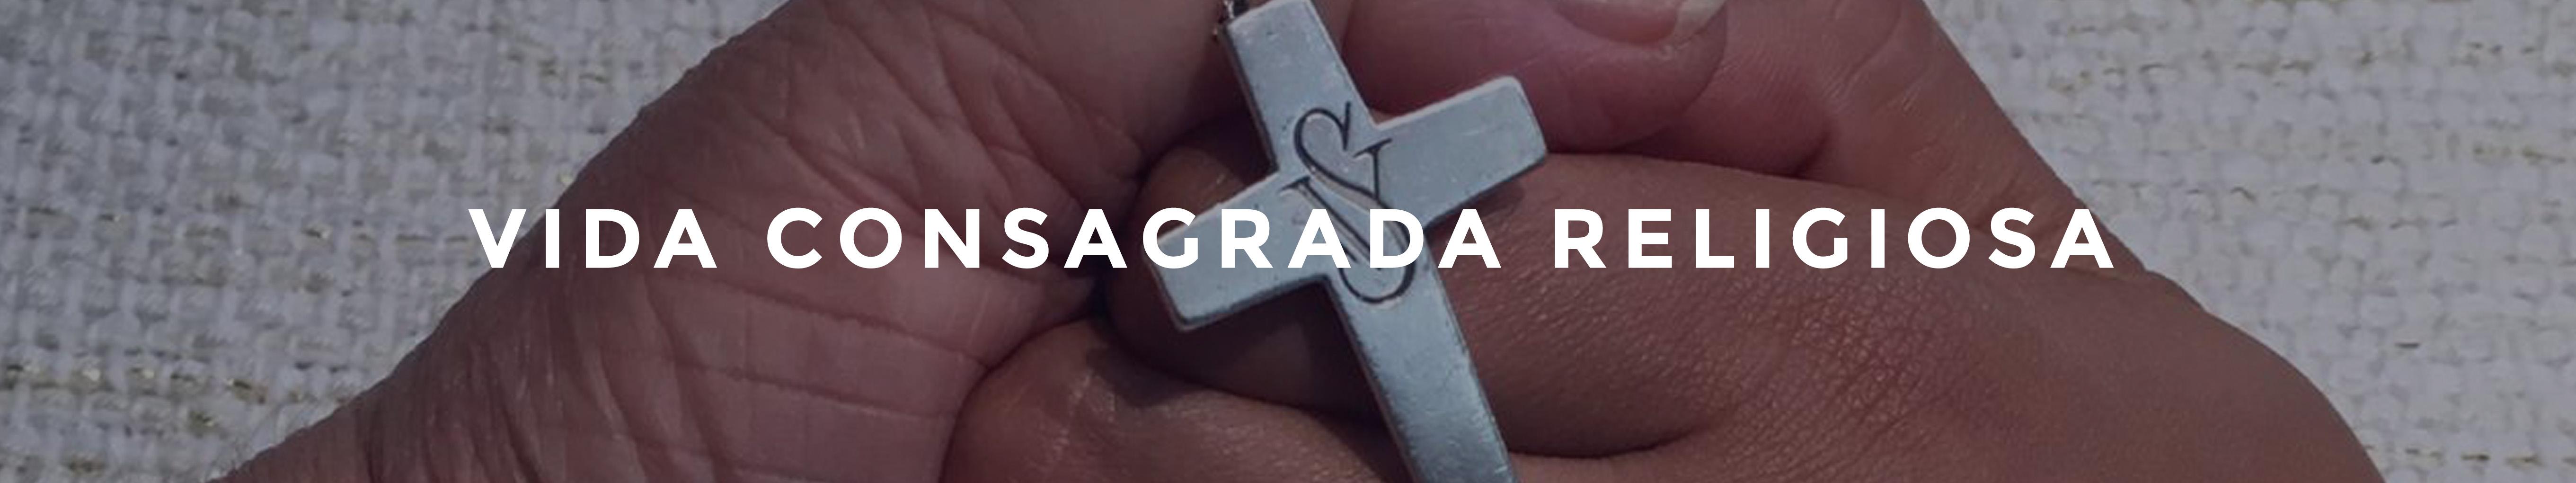 Vida Consagrada Religiosa